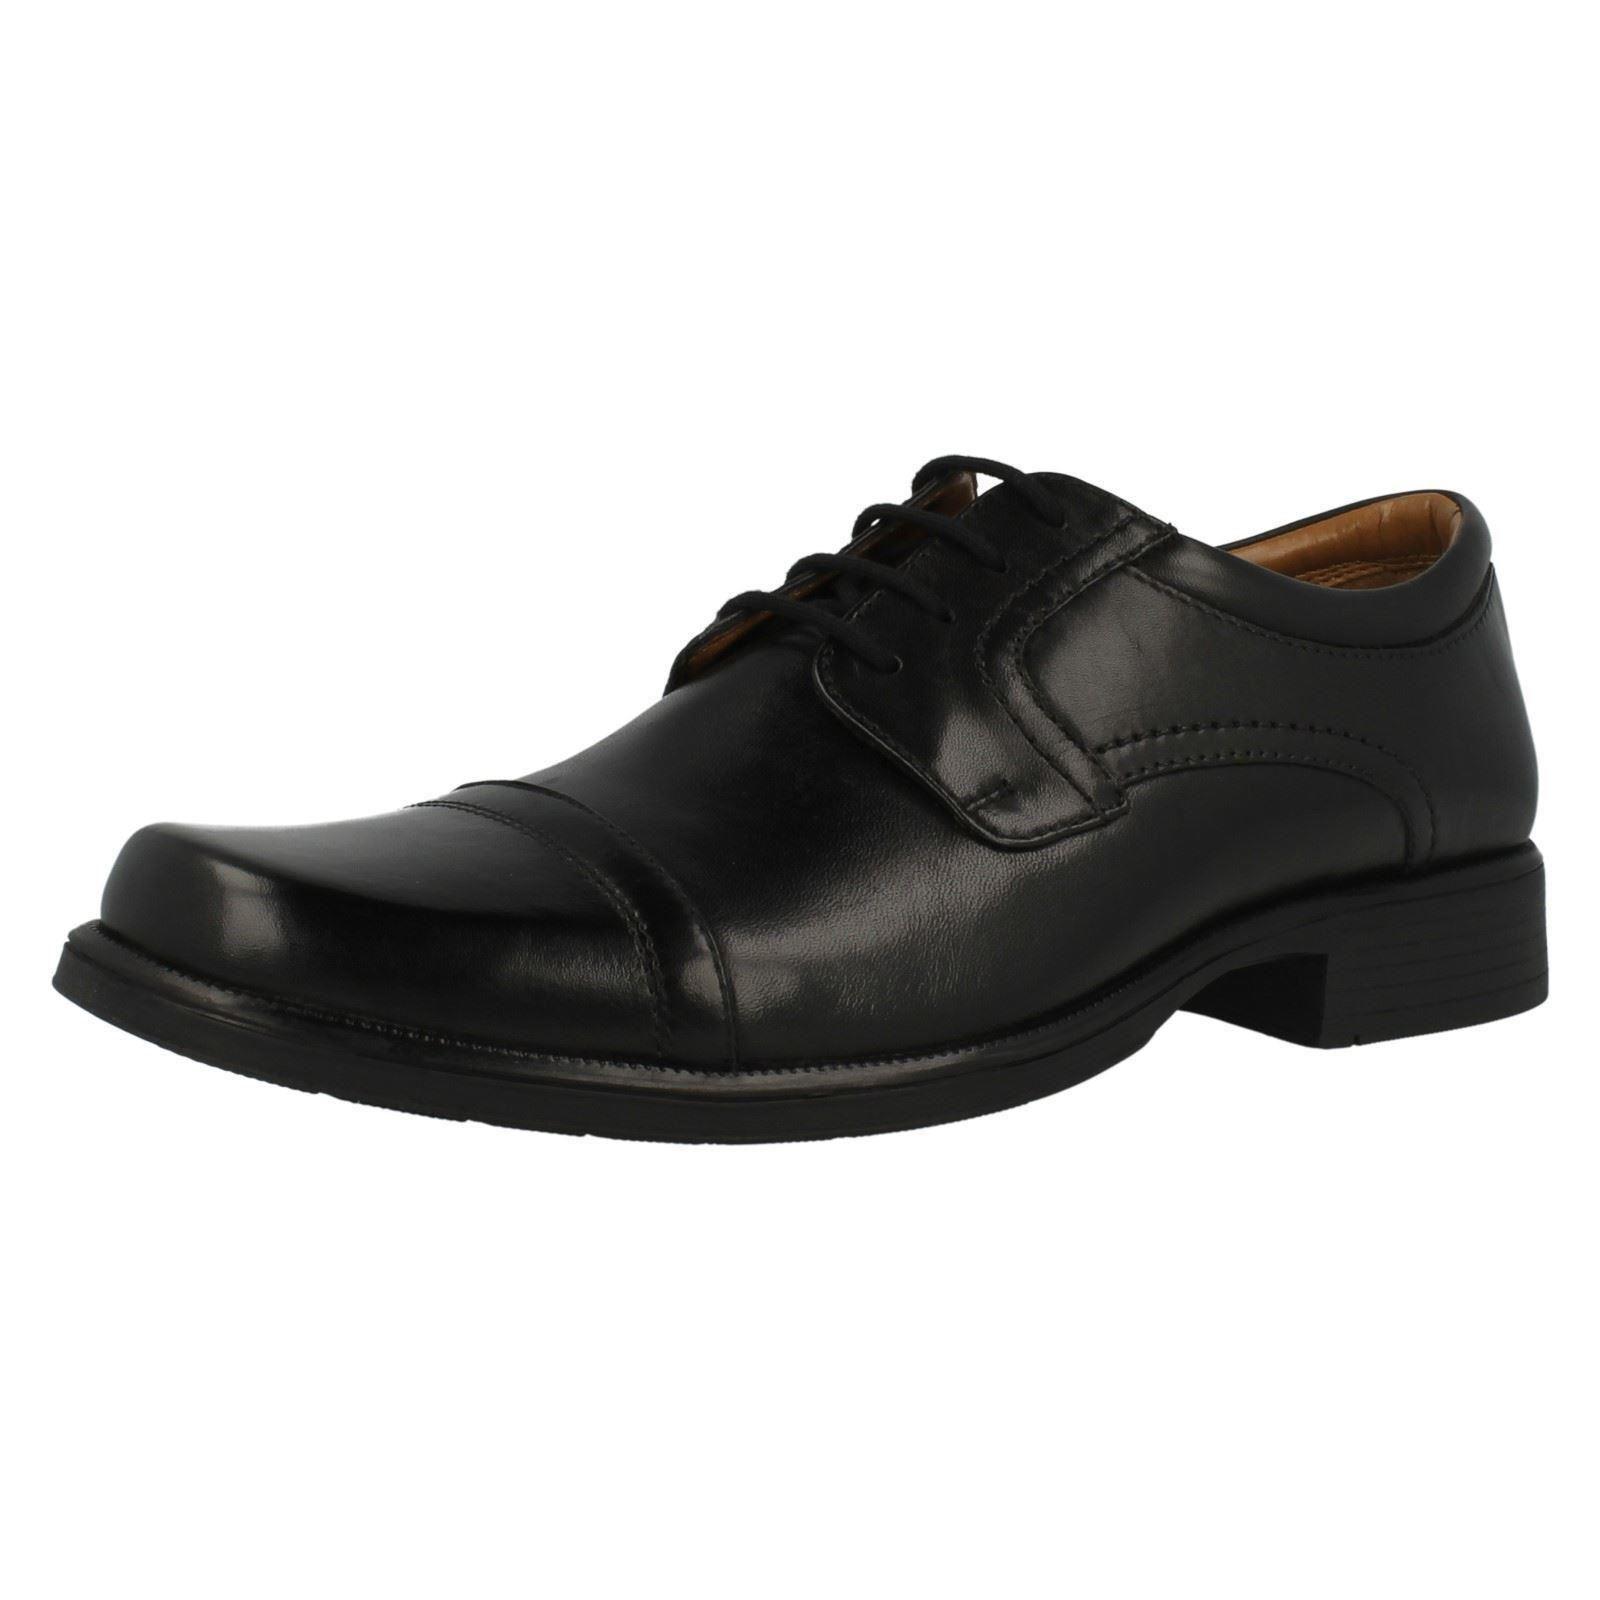 Herren Clarks Schwarz Leather Schuhe Harfe Kappe G Passform  | Rabatt